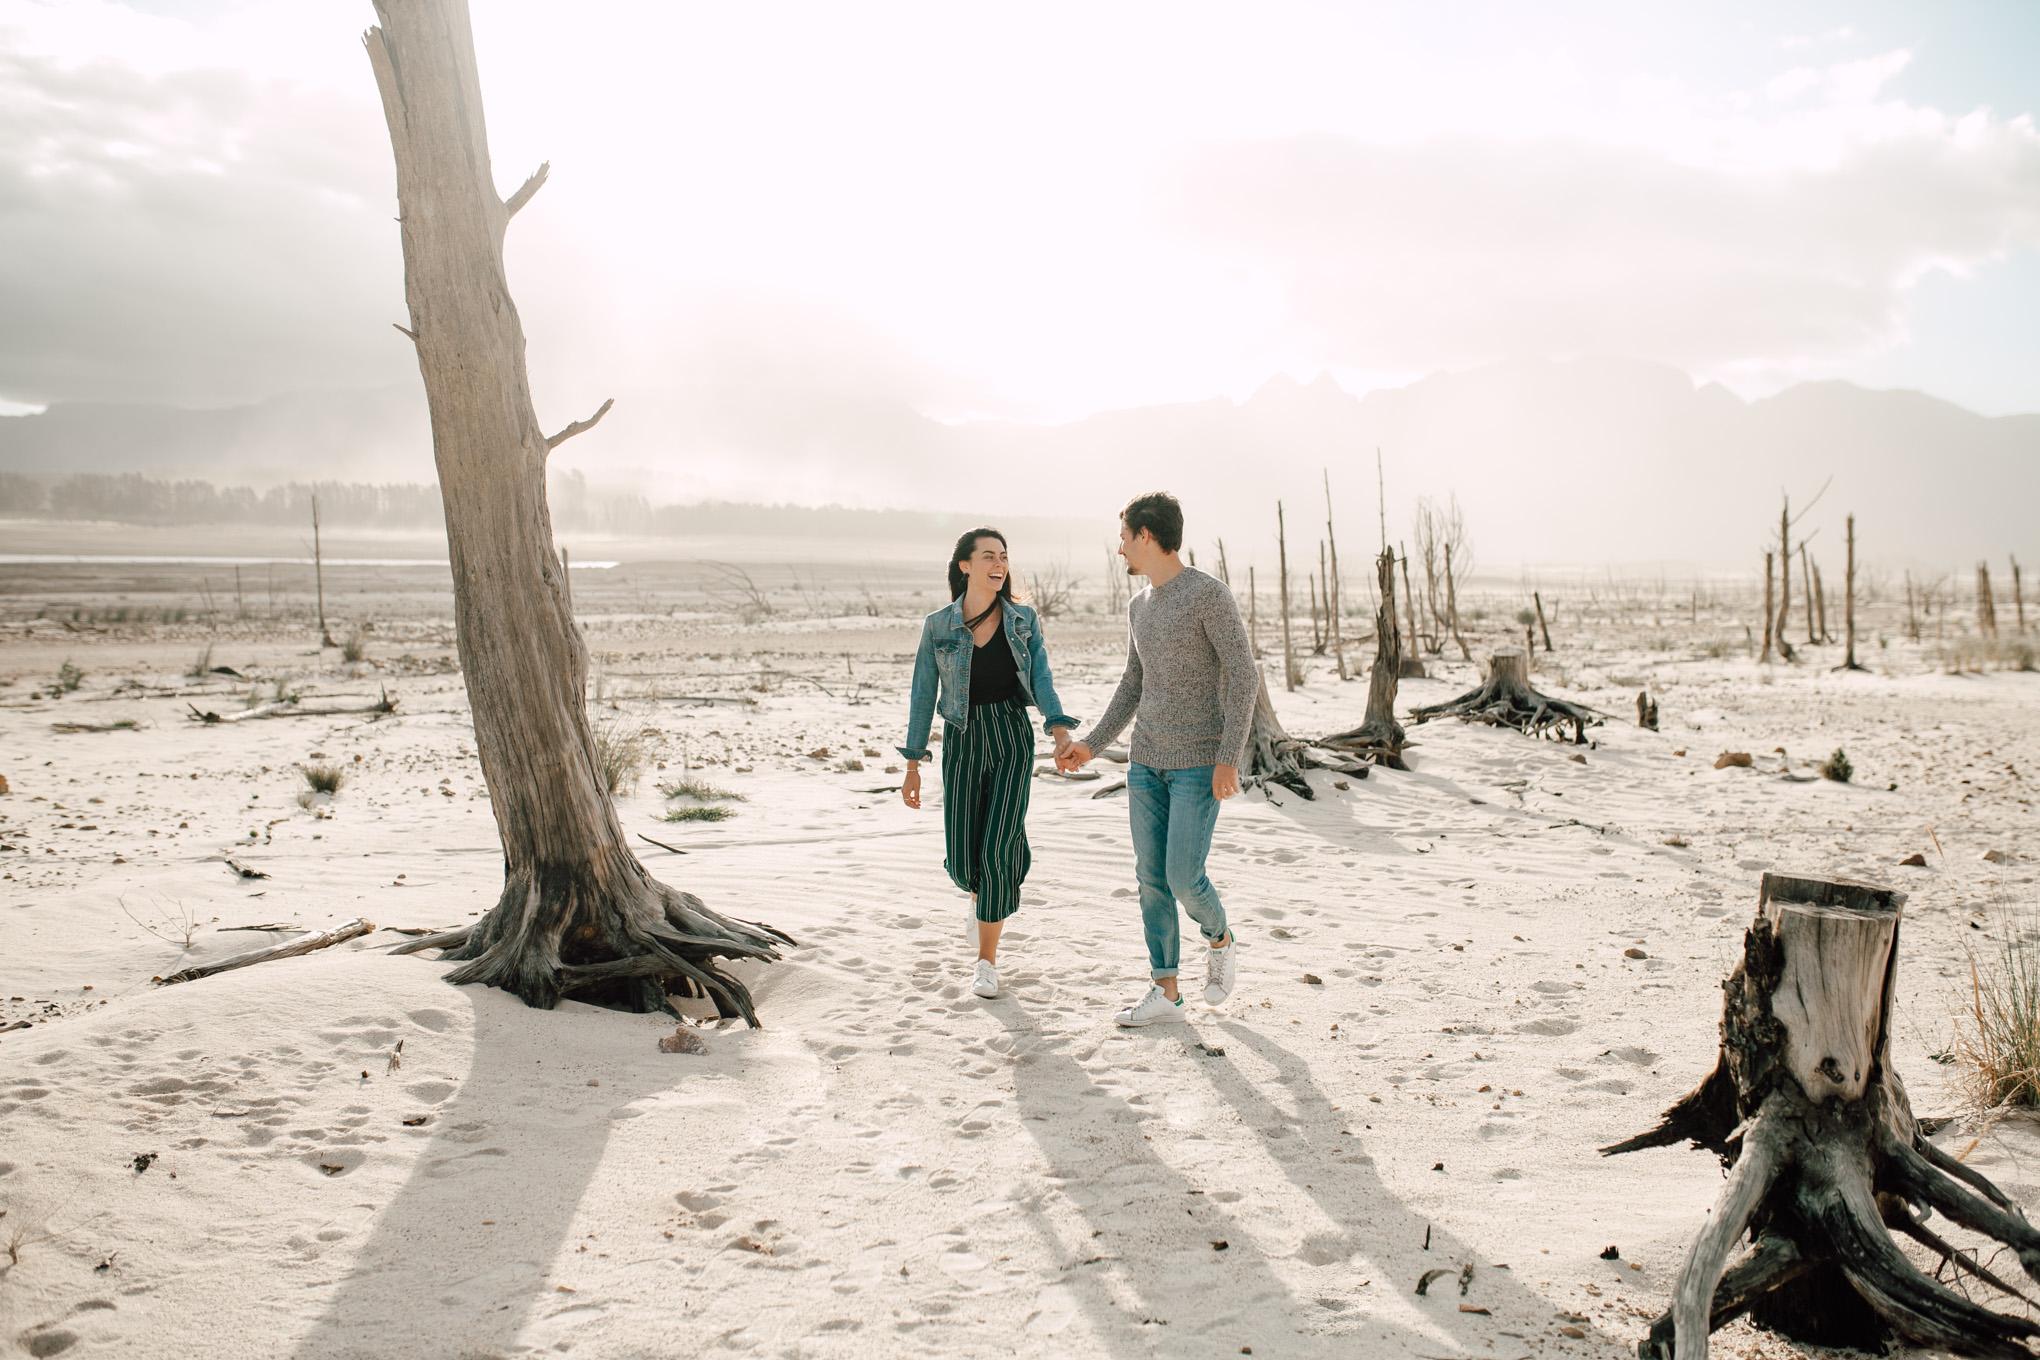 Cape-Town-Pia-Anna-Christian-Wedding-Photography-South-Africa-KF-36.jpg